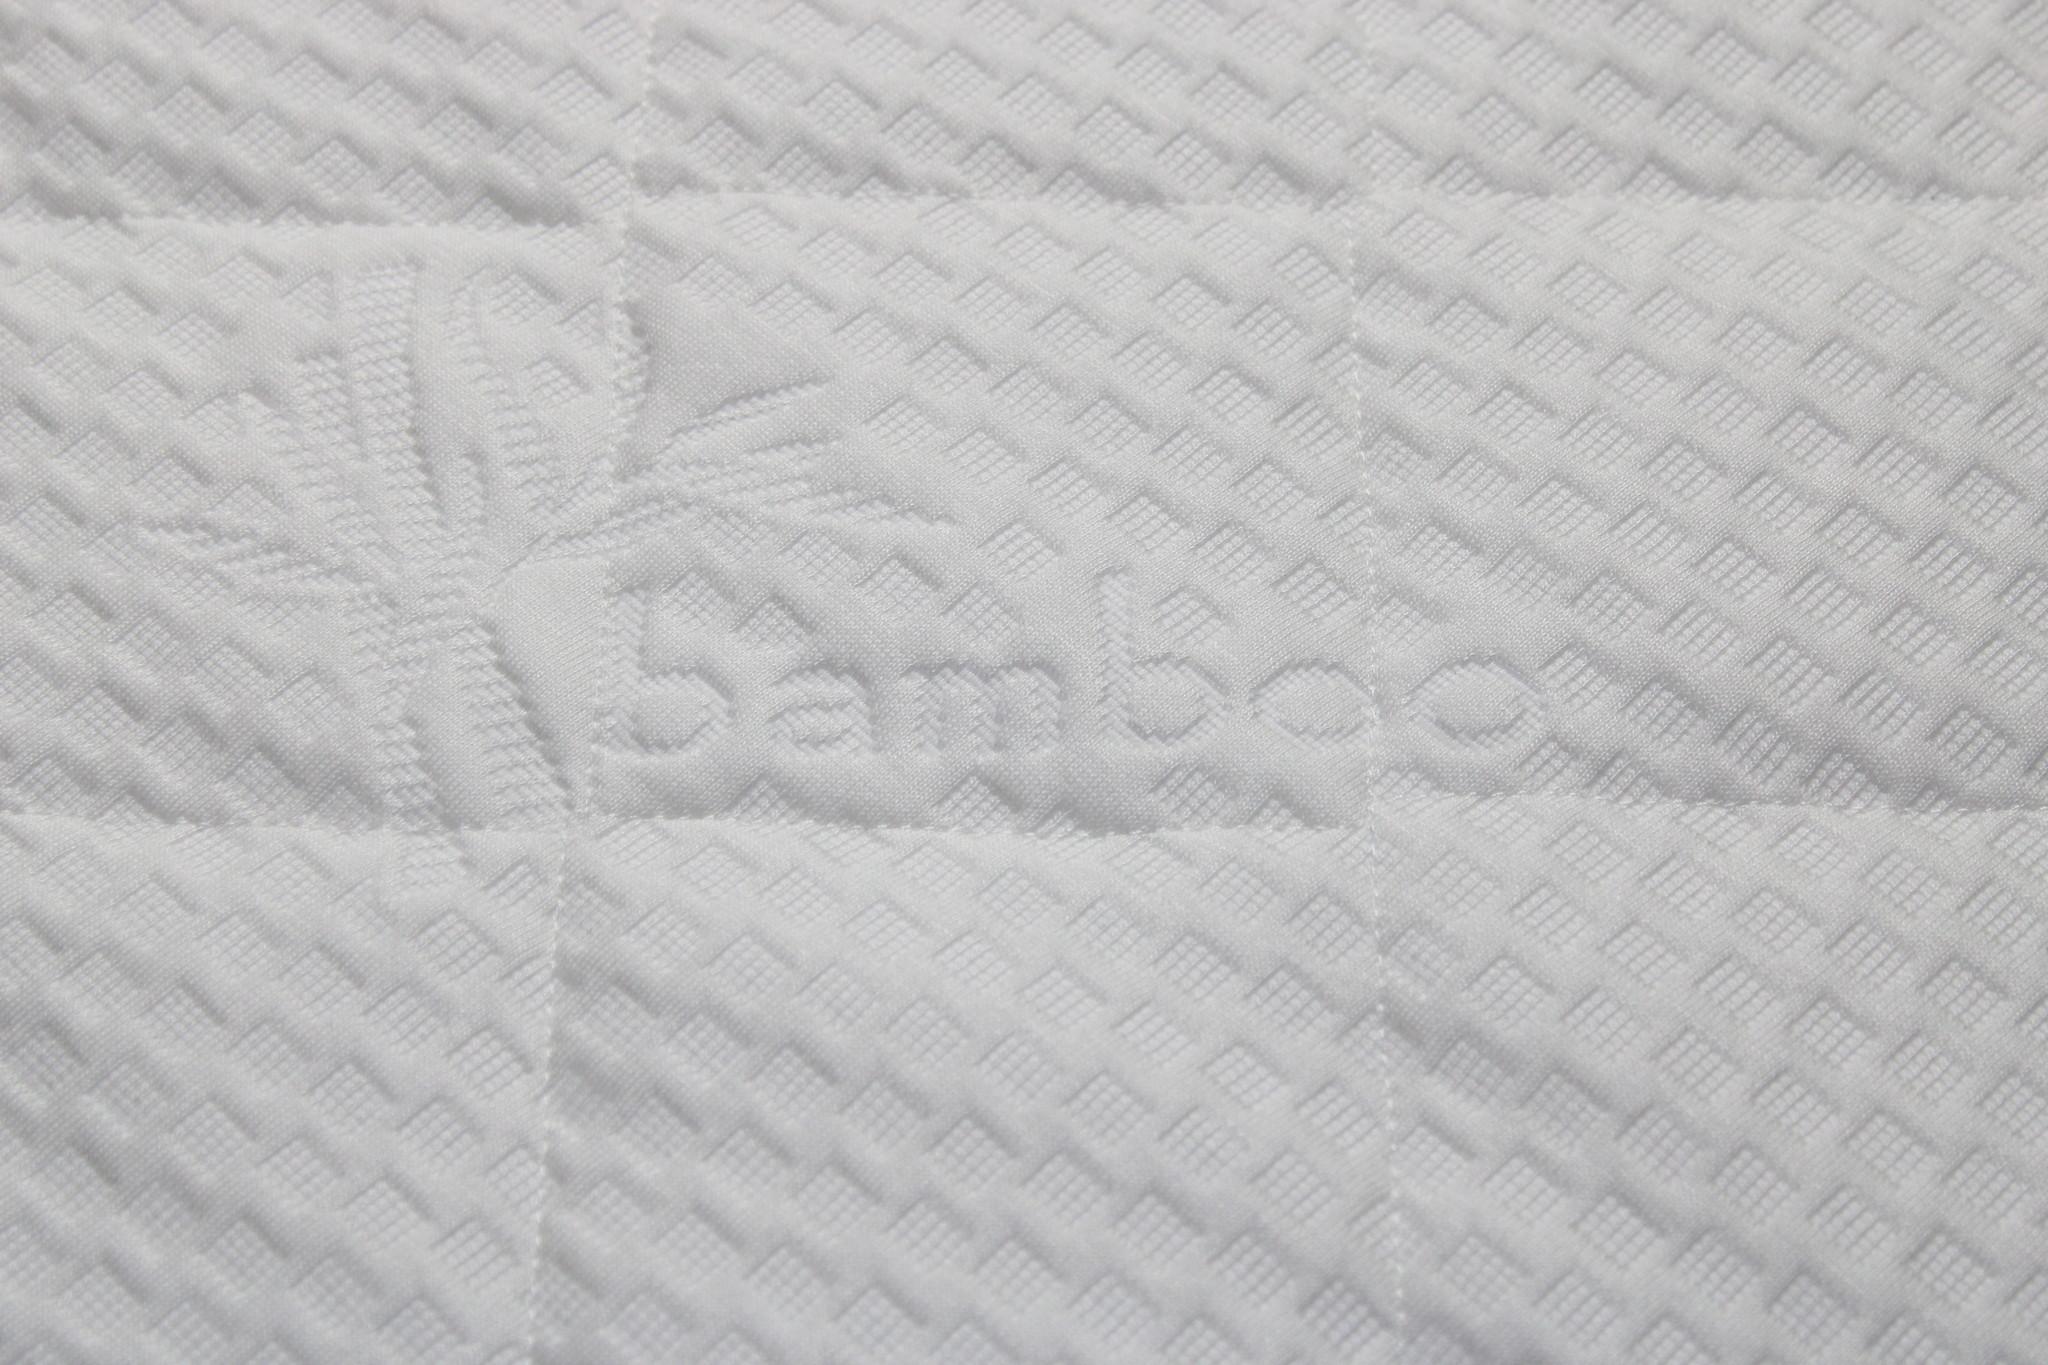 Sarpy Kindermatras 90x190 koudschuim HR55 bamboo